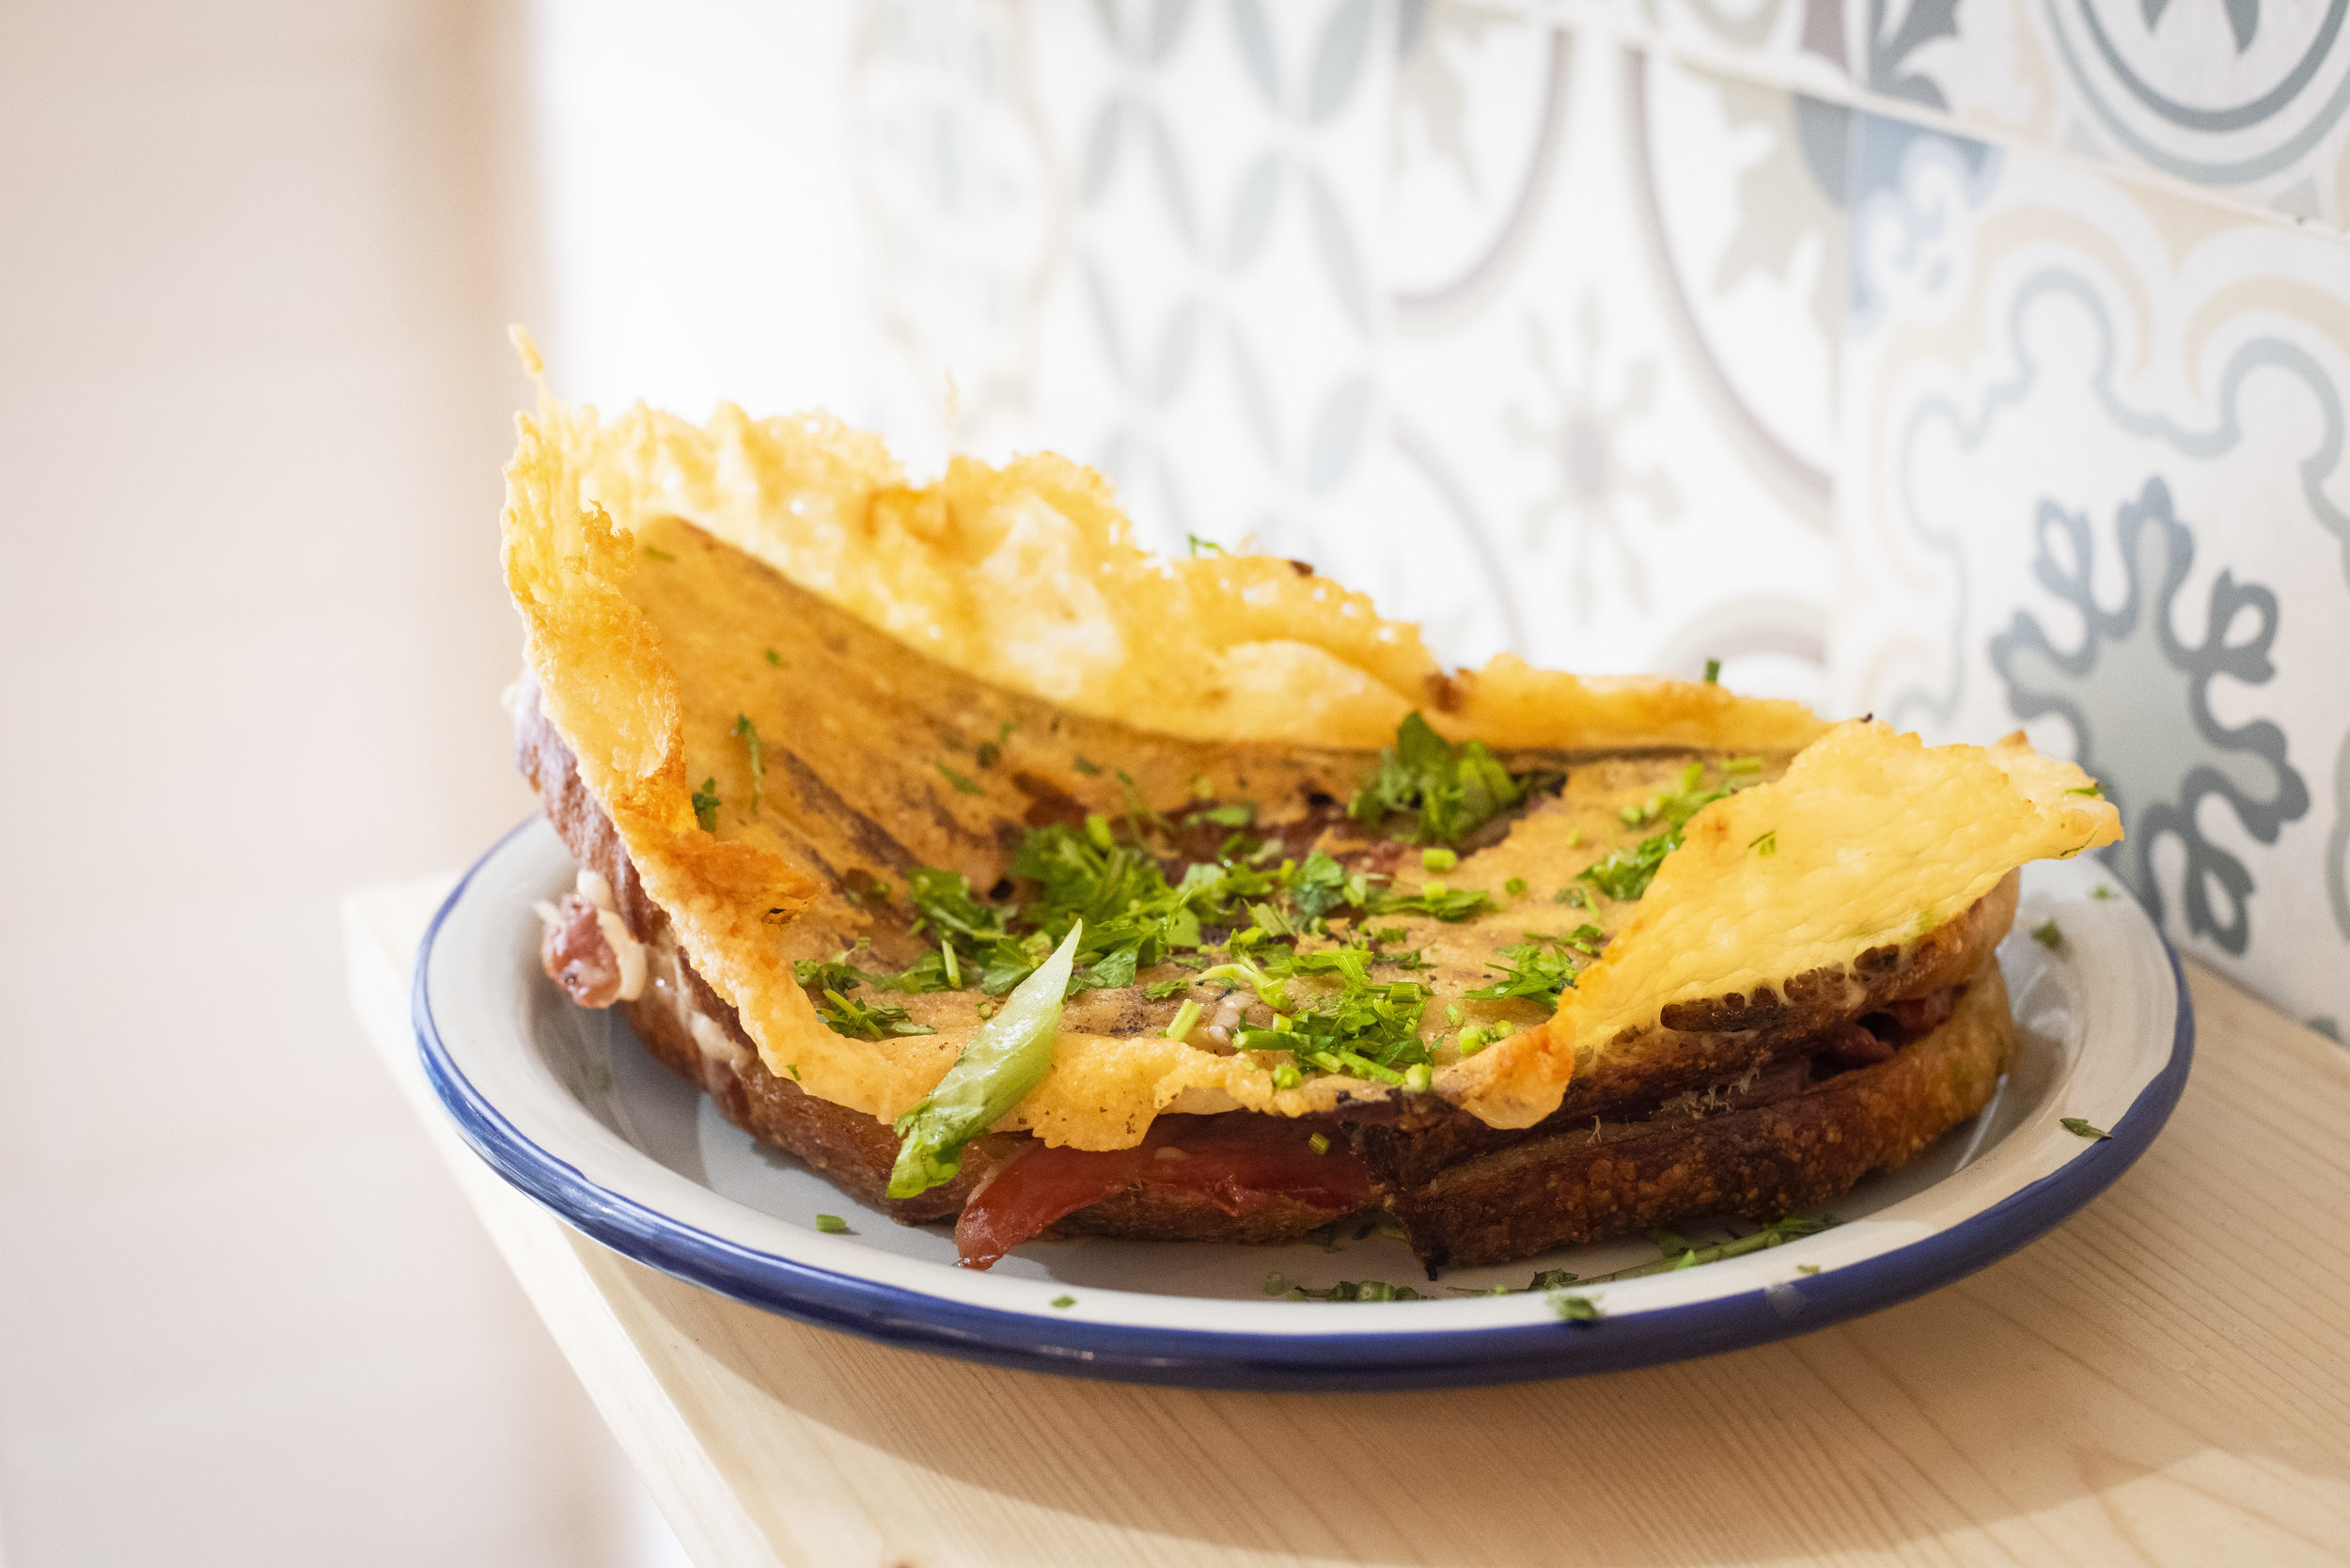 Grilled cheese sandwich at La Piña Bar, Barcelona